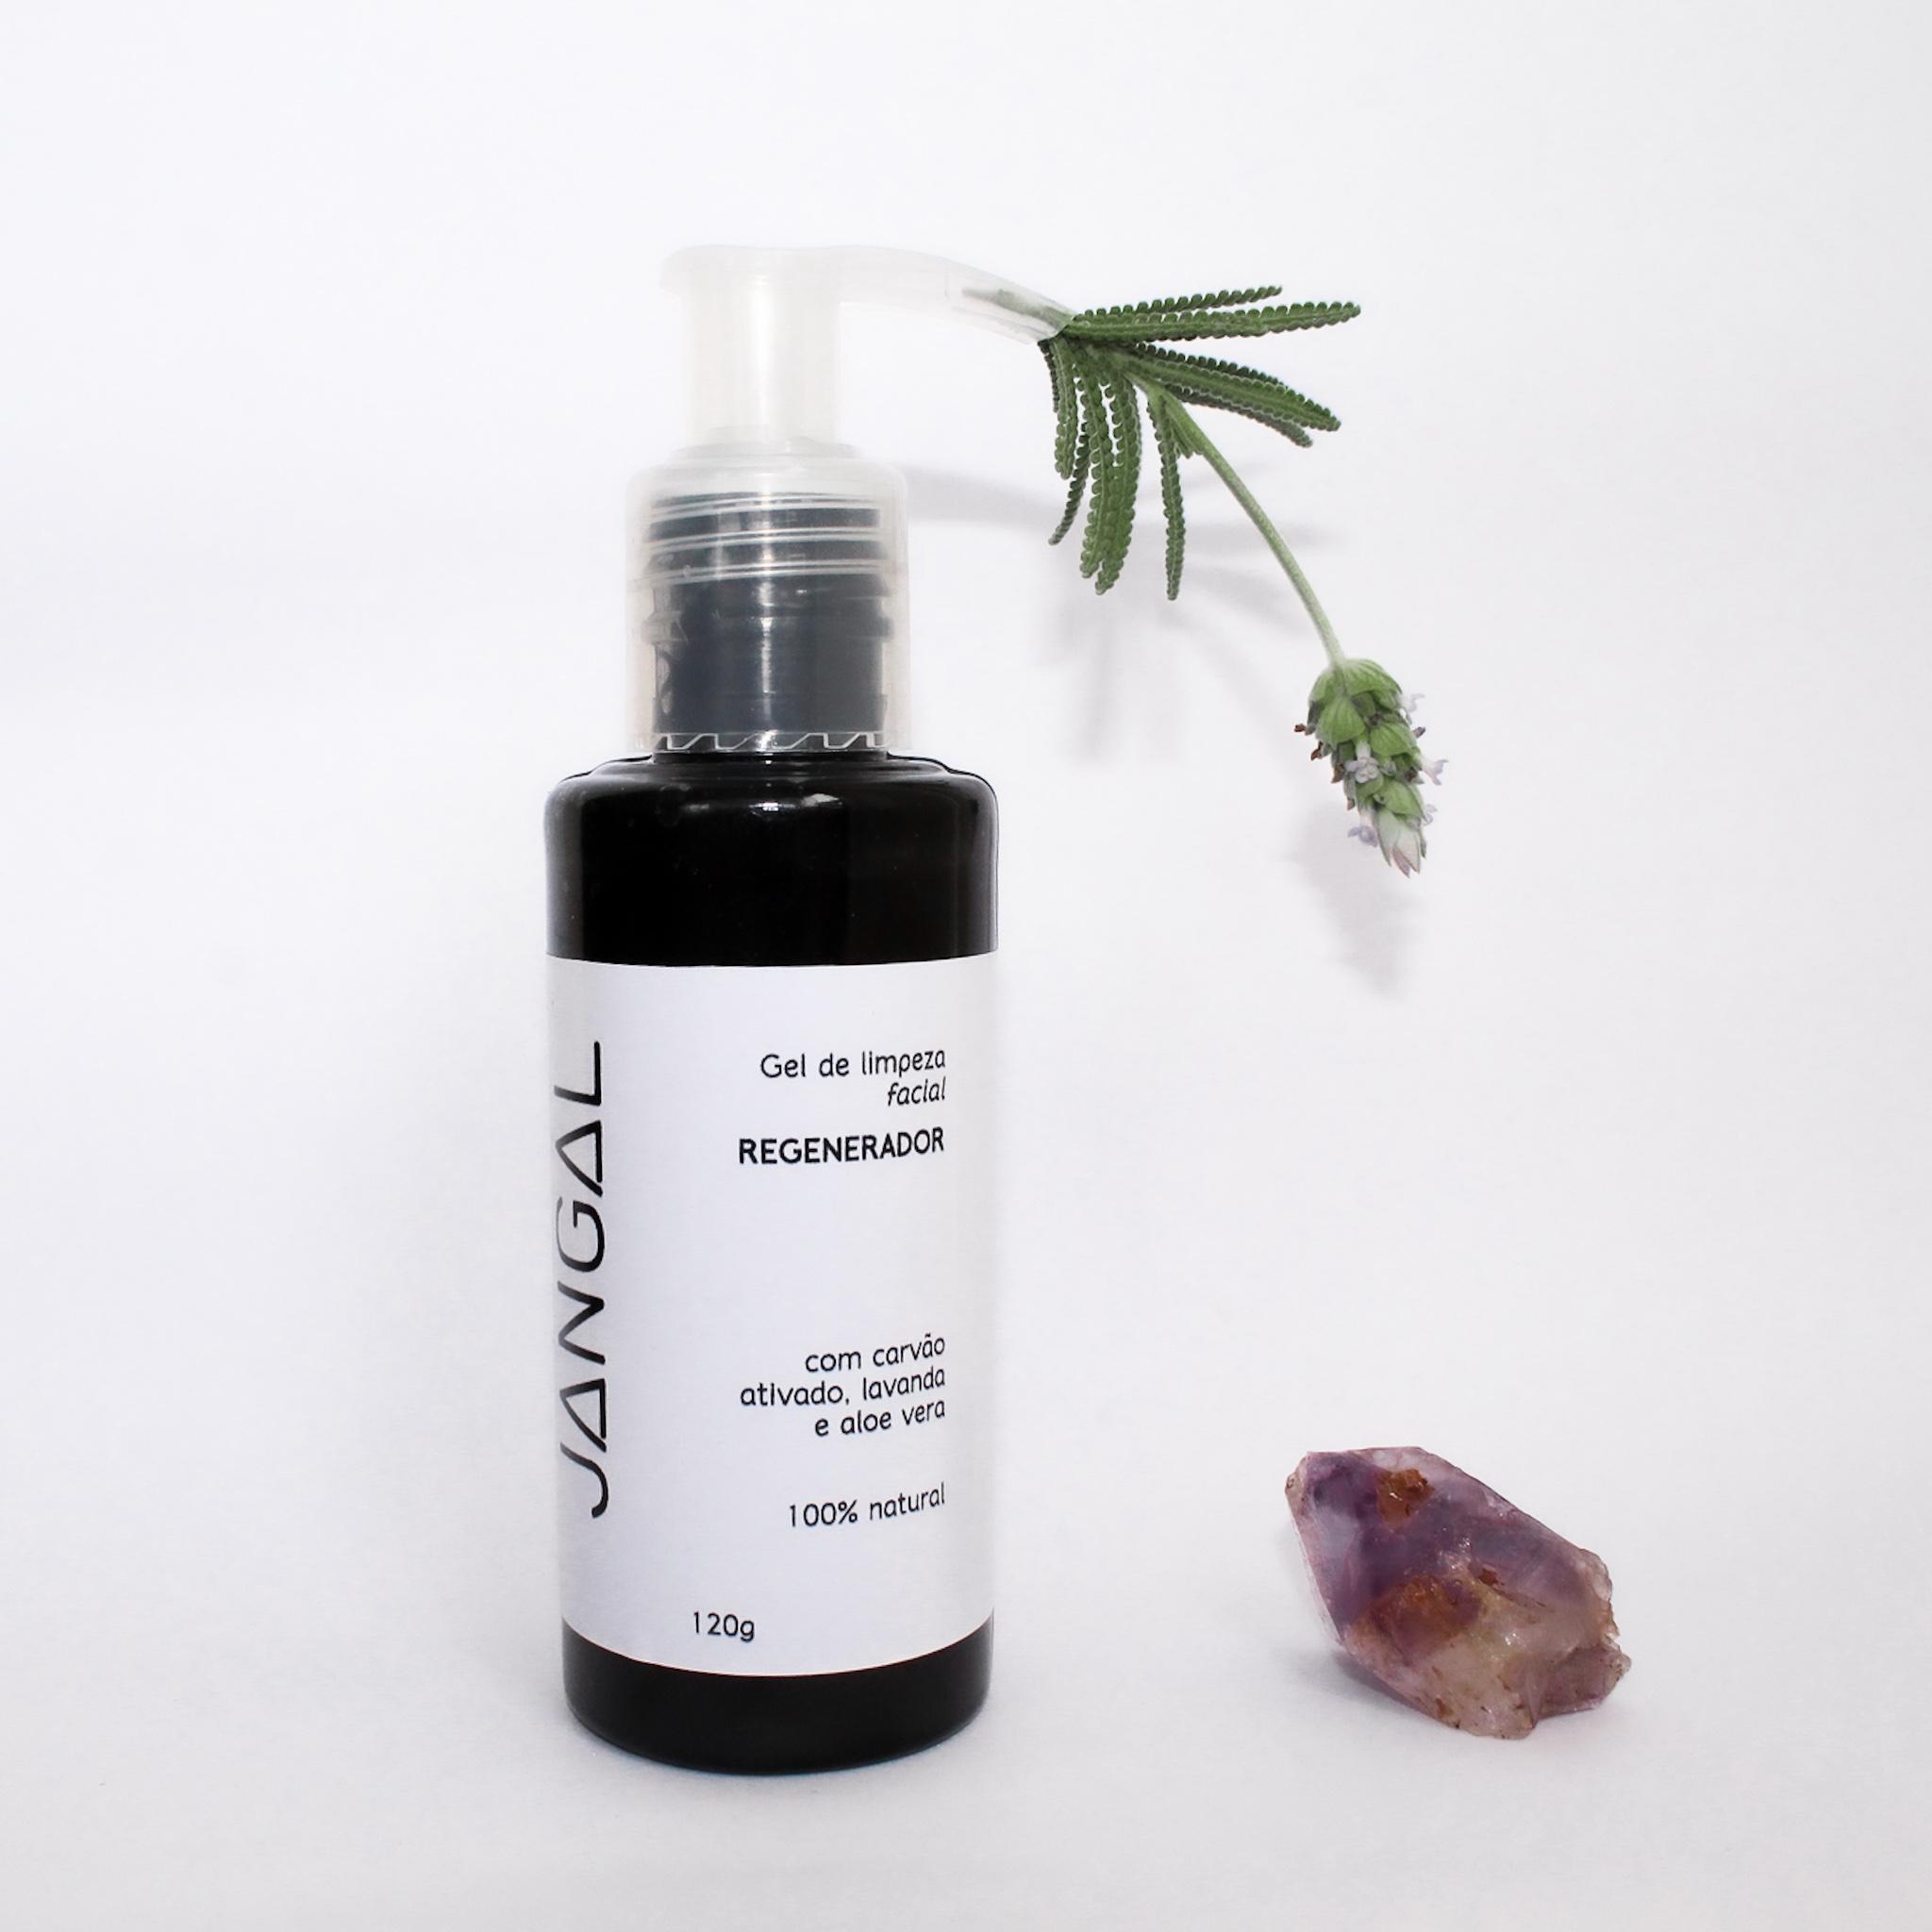 gel de limpeza facial cosmético natural e vegano remove cravinhos